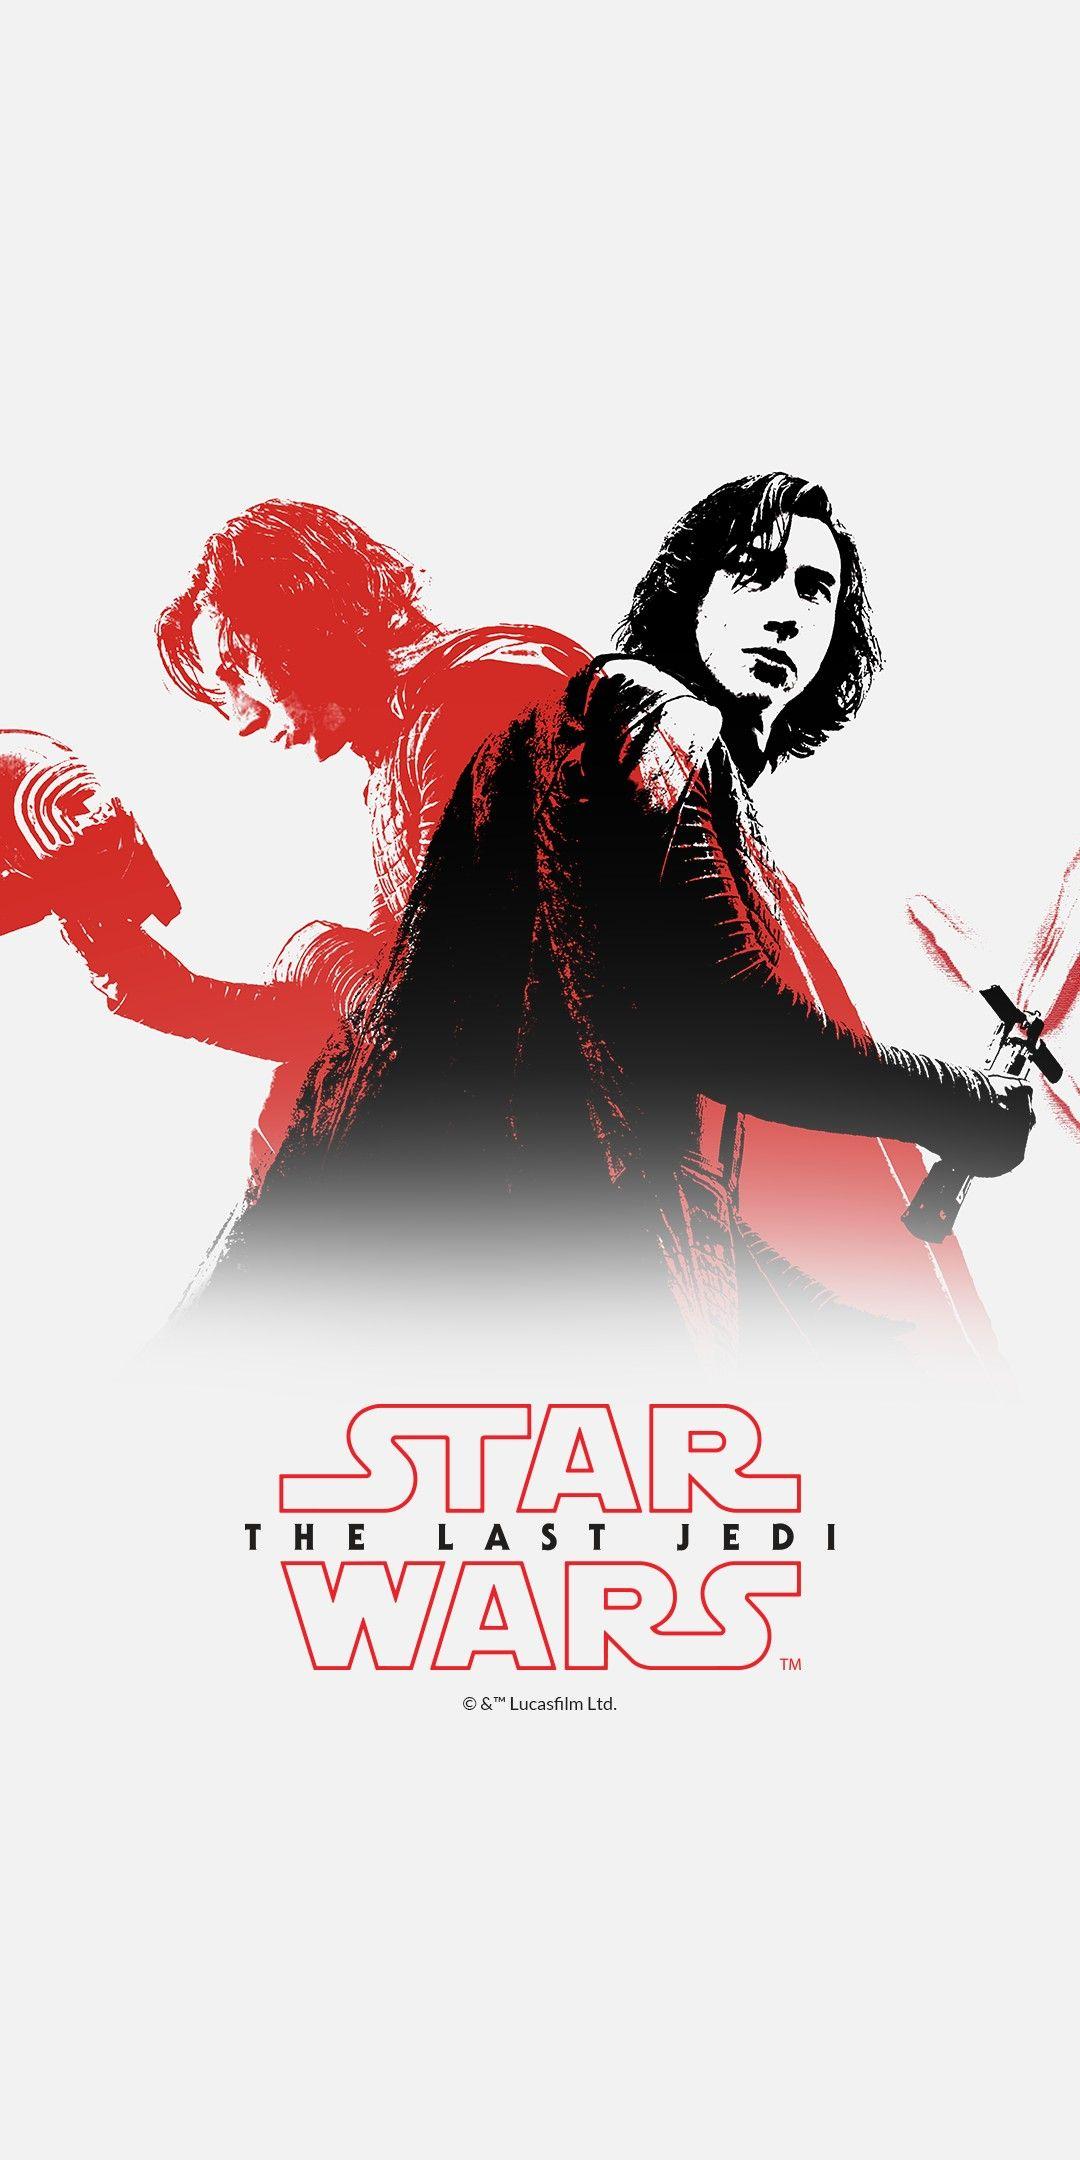 Star Wars The Last Jedi Star Wars Wallpaper Iphone Star Wars Background Star Wars Quotes